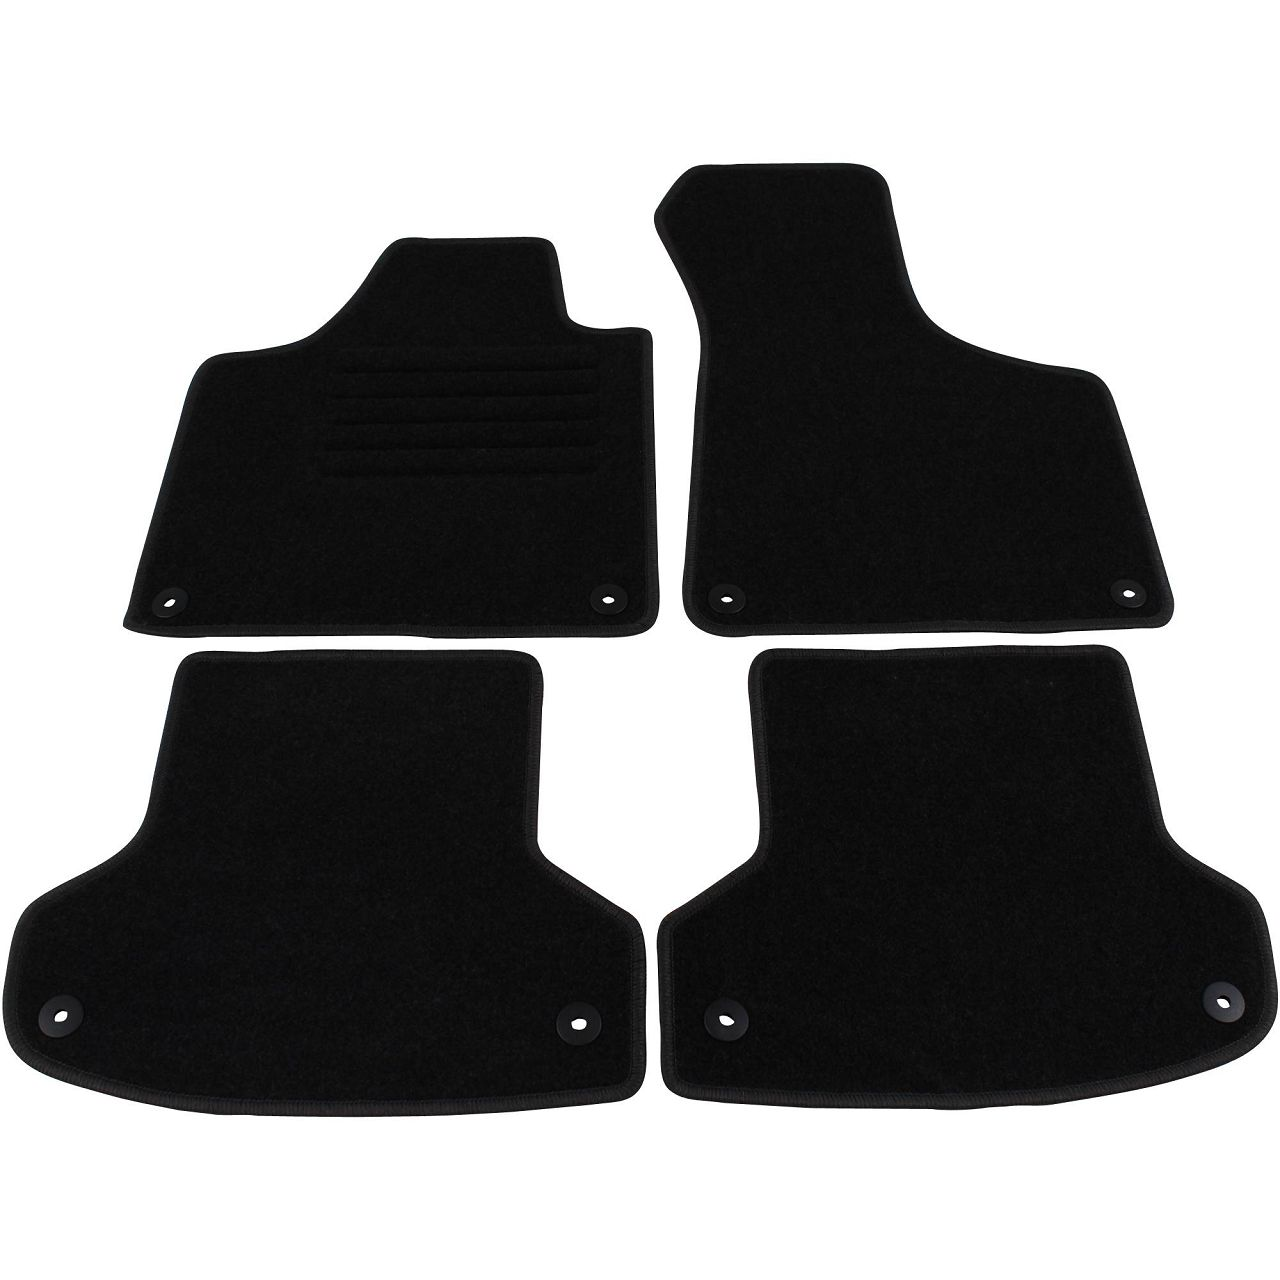 Veloursmatten Textilmatten Fußmatten Automatten AUDI A3 S3 RS3 (8P) 4-teilig